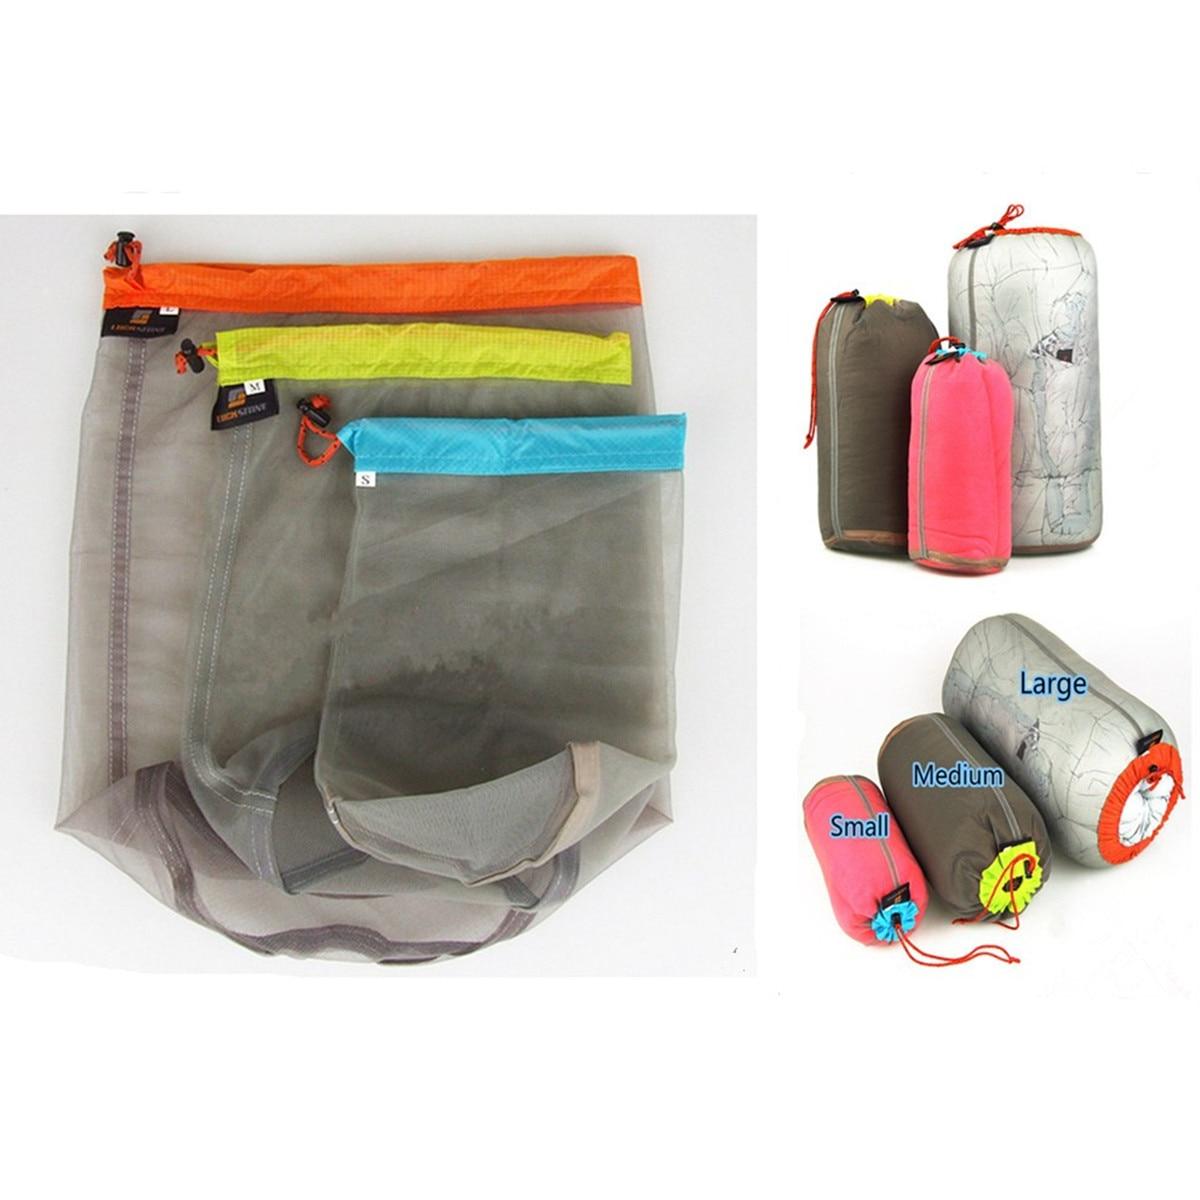 Hiking Storage Bag Sports Outdoors trip Ultralight Stuff Drawstring Bag Camping